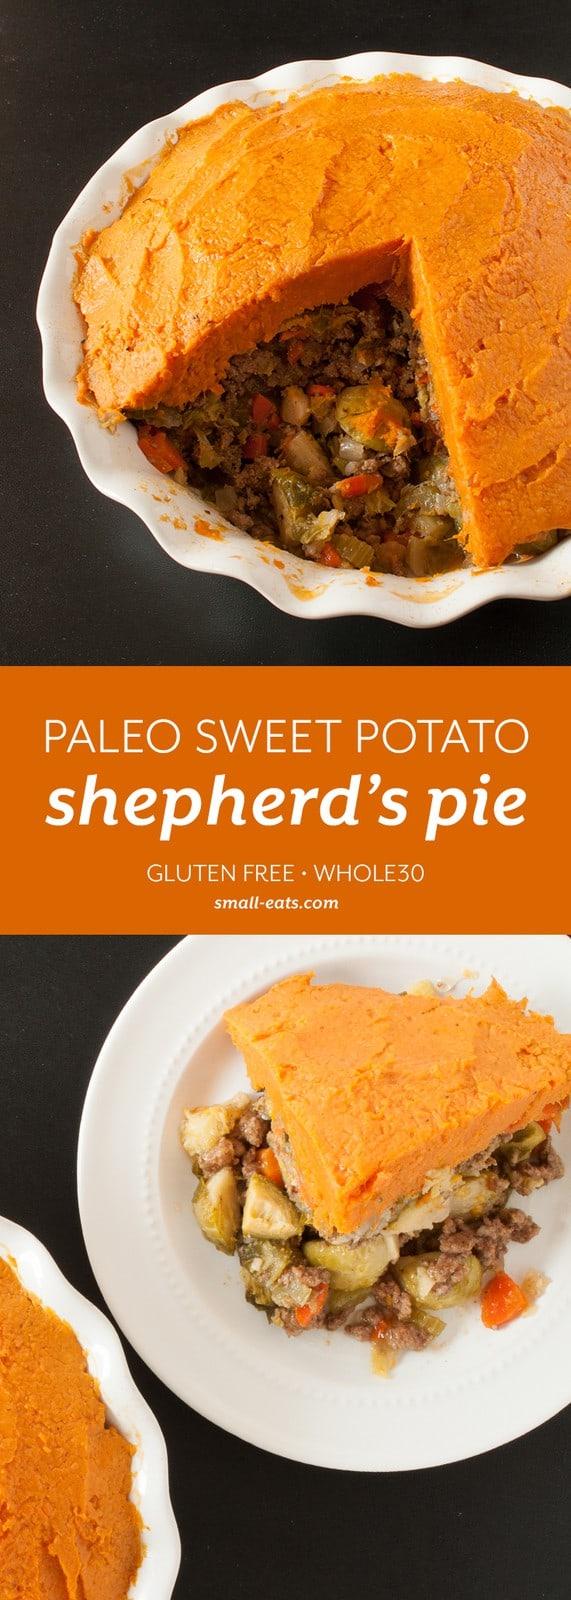 Enjoy a sweet potato, paleo twist on the classic Shepherd's pie.   Paleo Sweet Potato Shepherd's Pie from small-eats.com